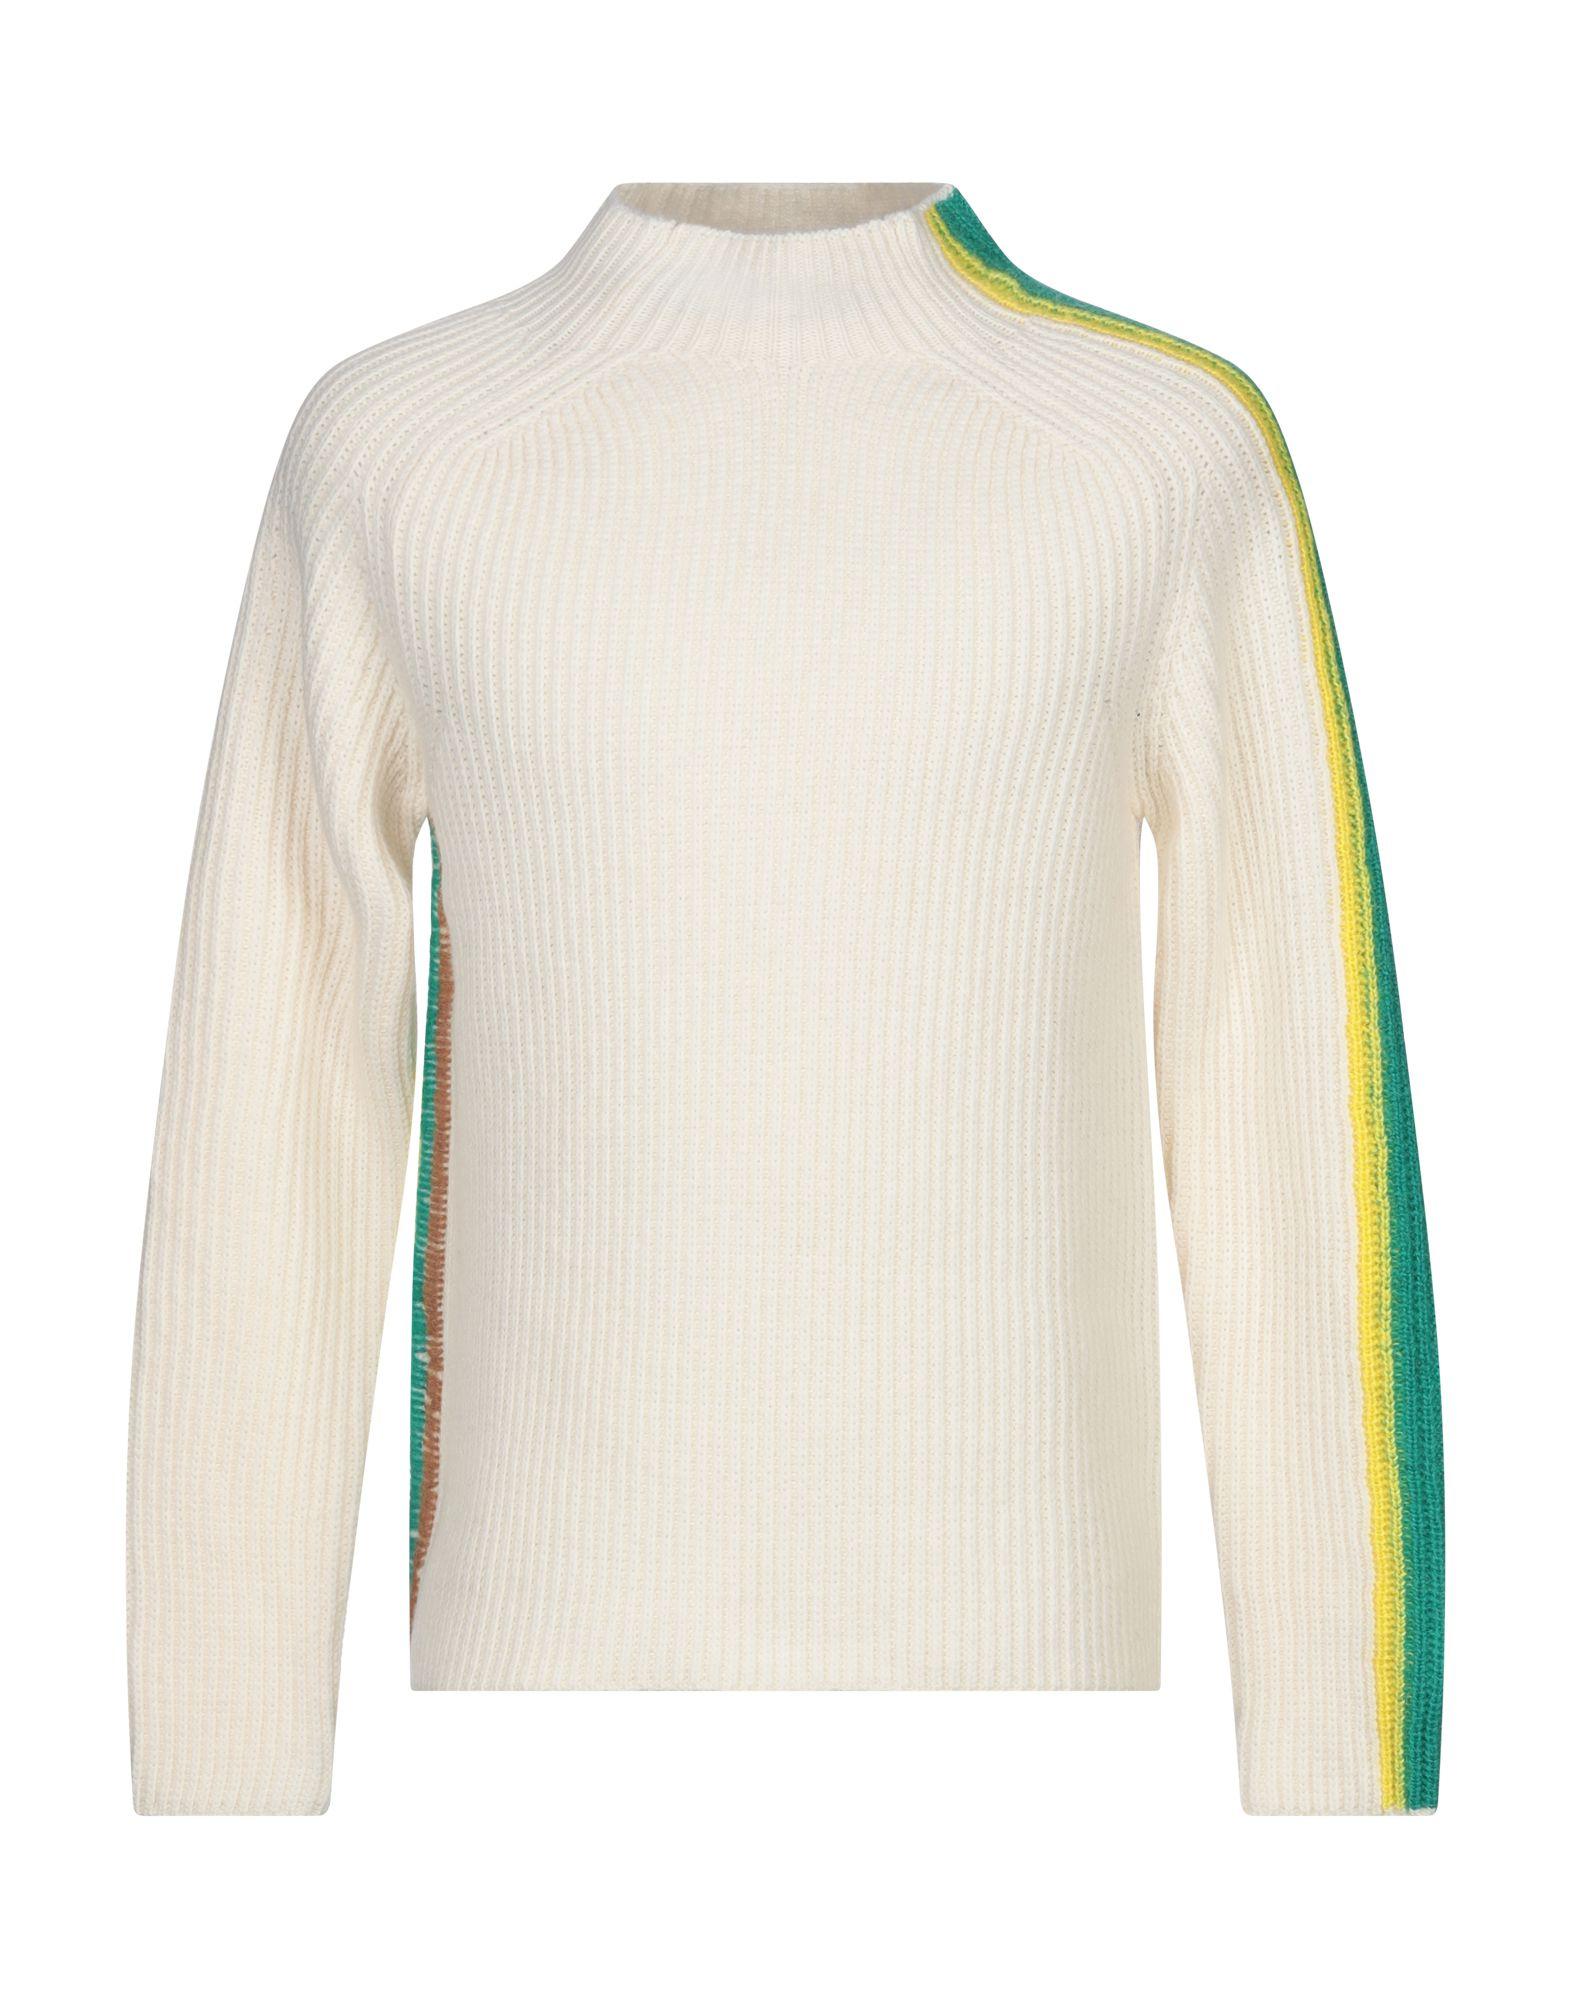 DANILO PAURA Водолазки брюки мужские oodji lab цвет индиго 2l210231m 23421n 7800n размер 38 46 182